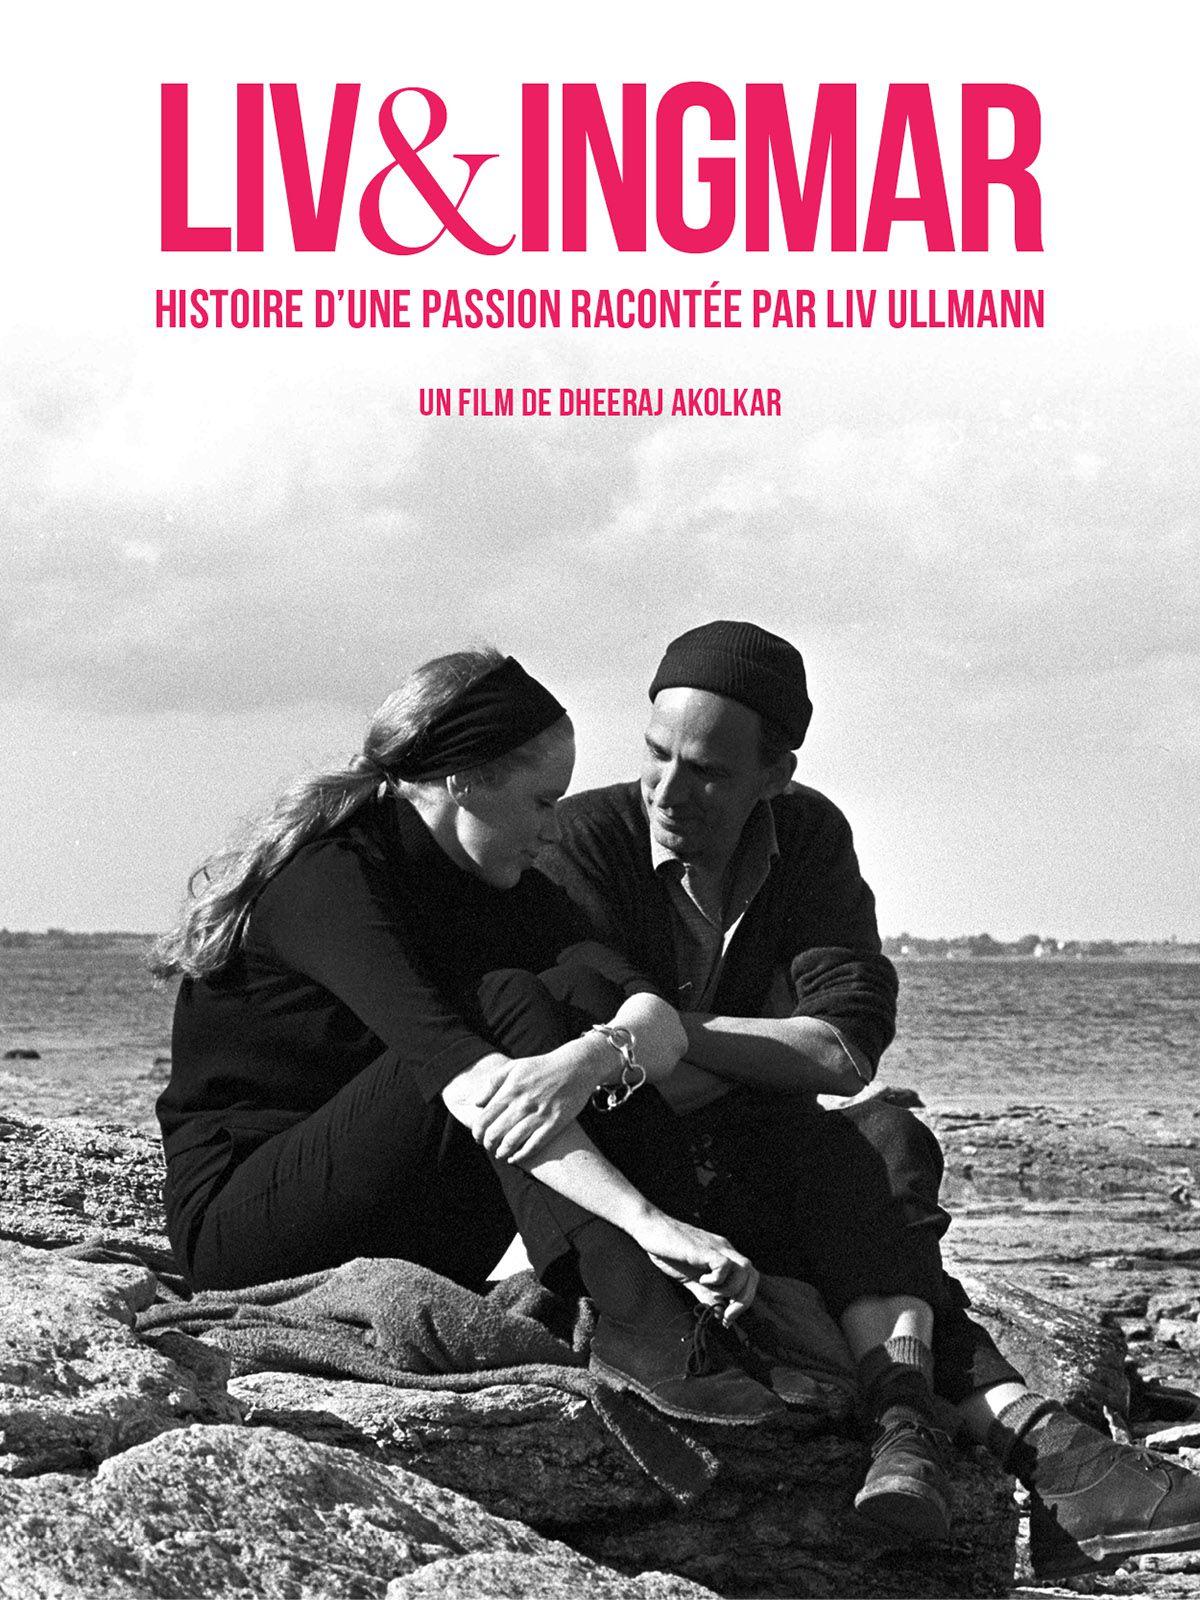 Liv & Ingmar - Documentaire (2013)